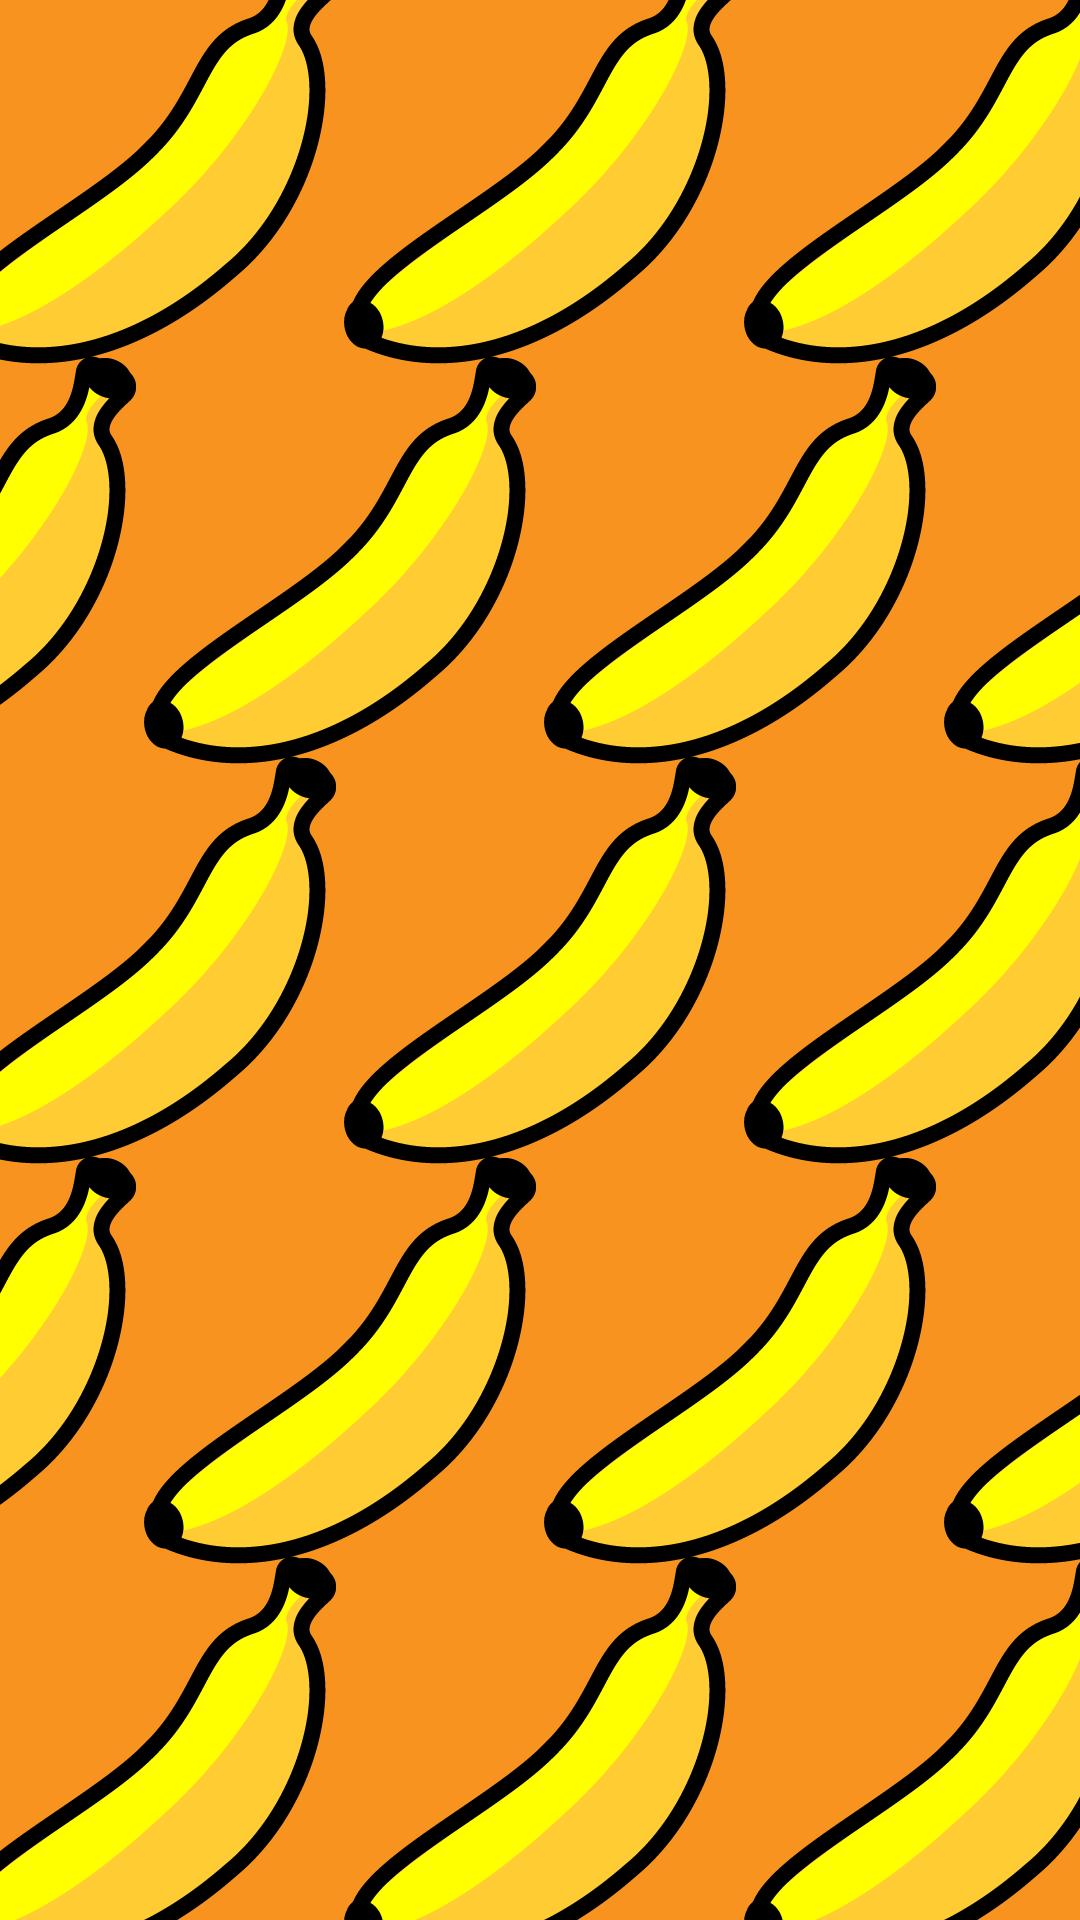 wallpaper1_banana-fill-orange-iphone